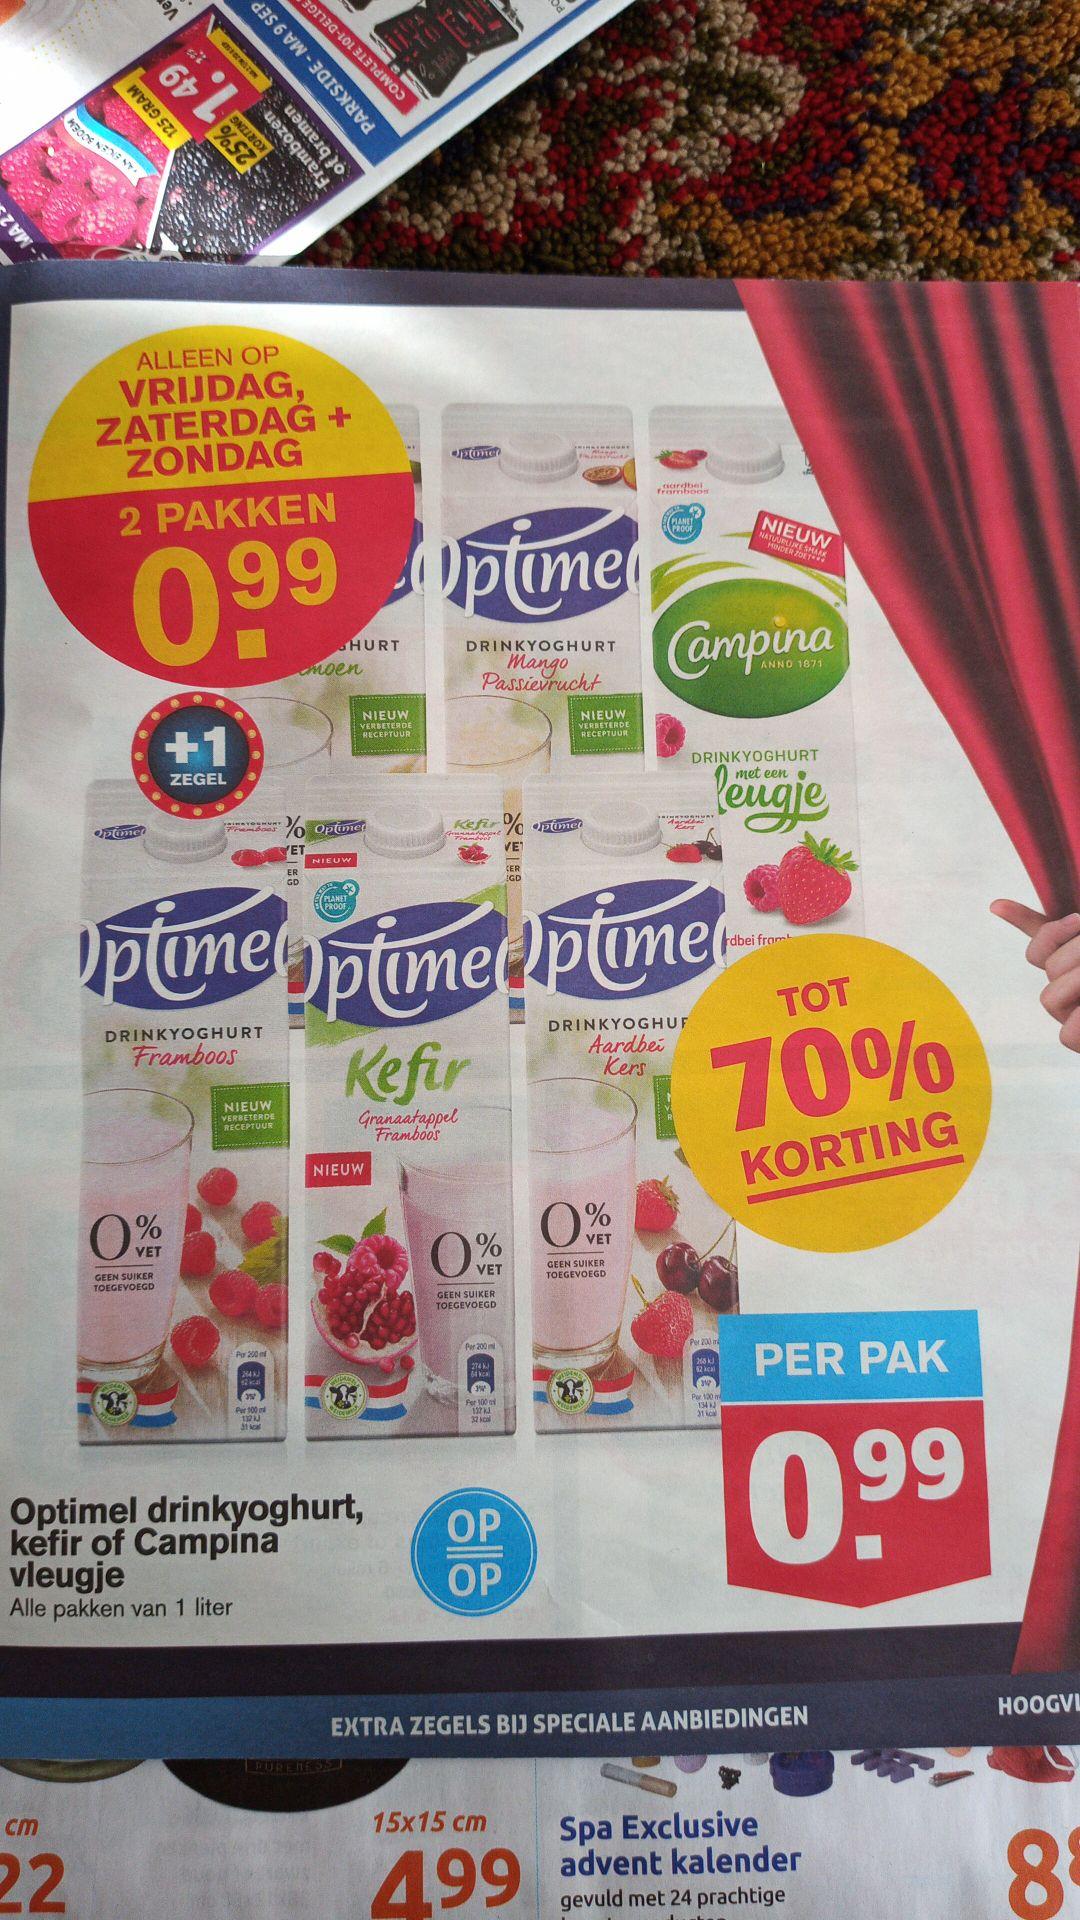 [Hoogvliet] Optimel drinkyoghurt, kefir of Campina vleugje 2 pakken €0,99 (vr, za, zo)